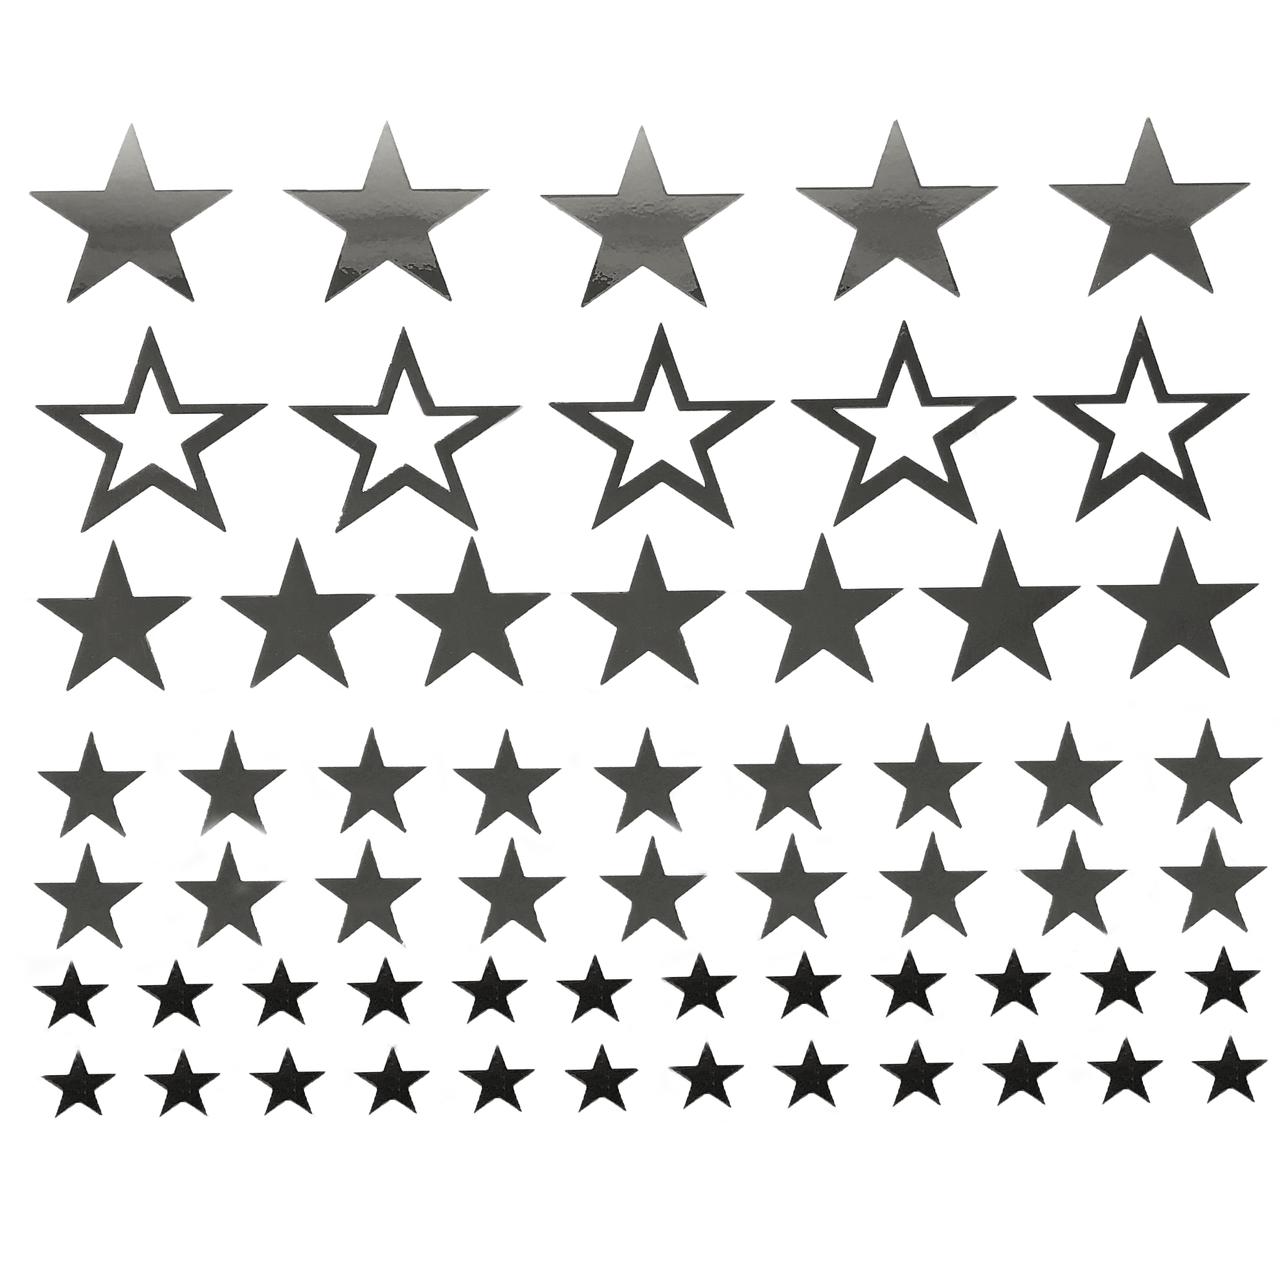 Набор наклеек Звезды зеркальные серебро + монтажная пленка